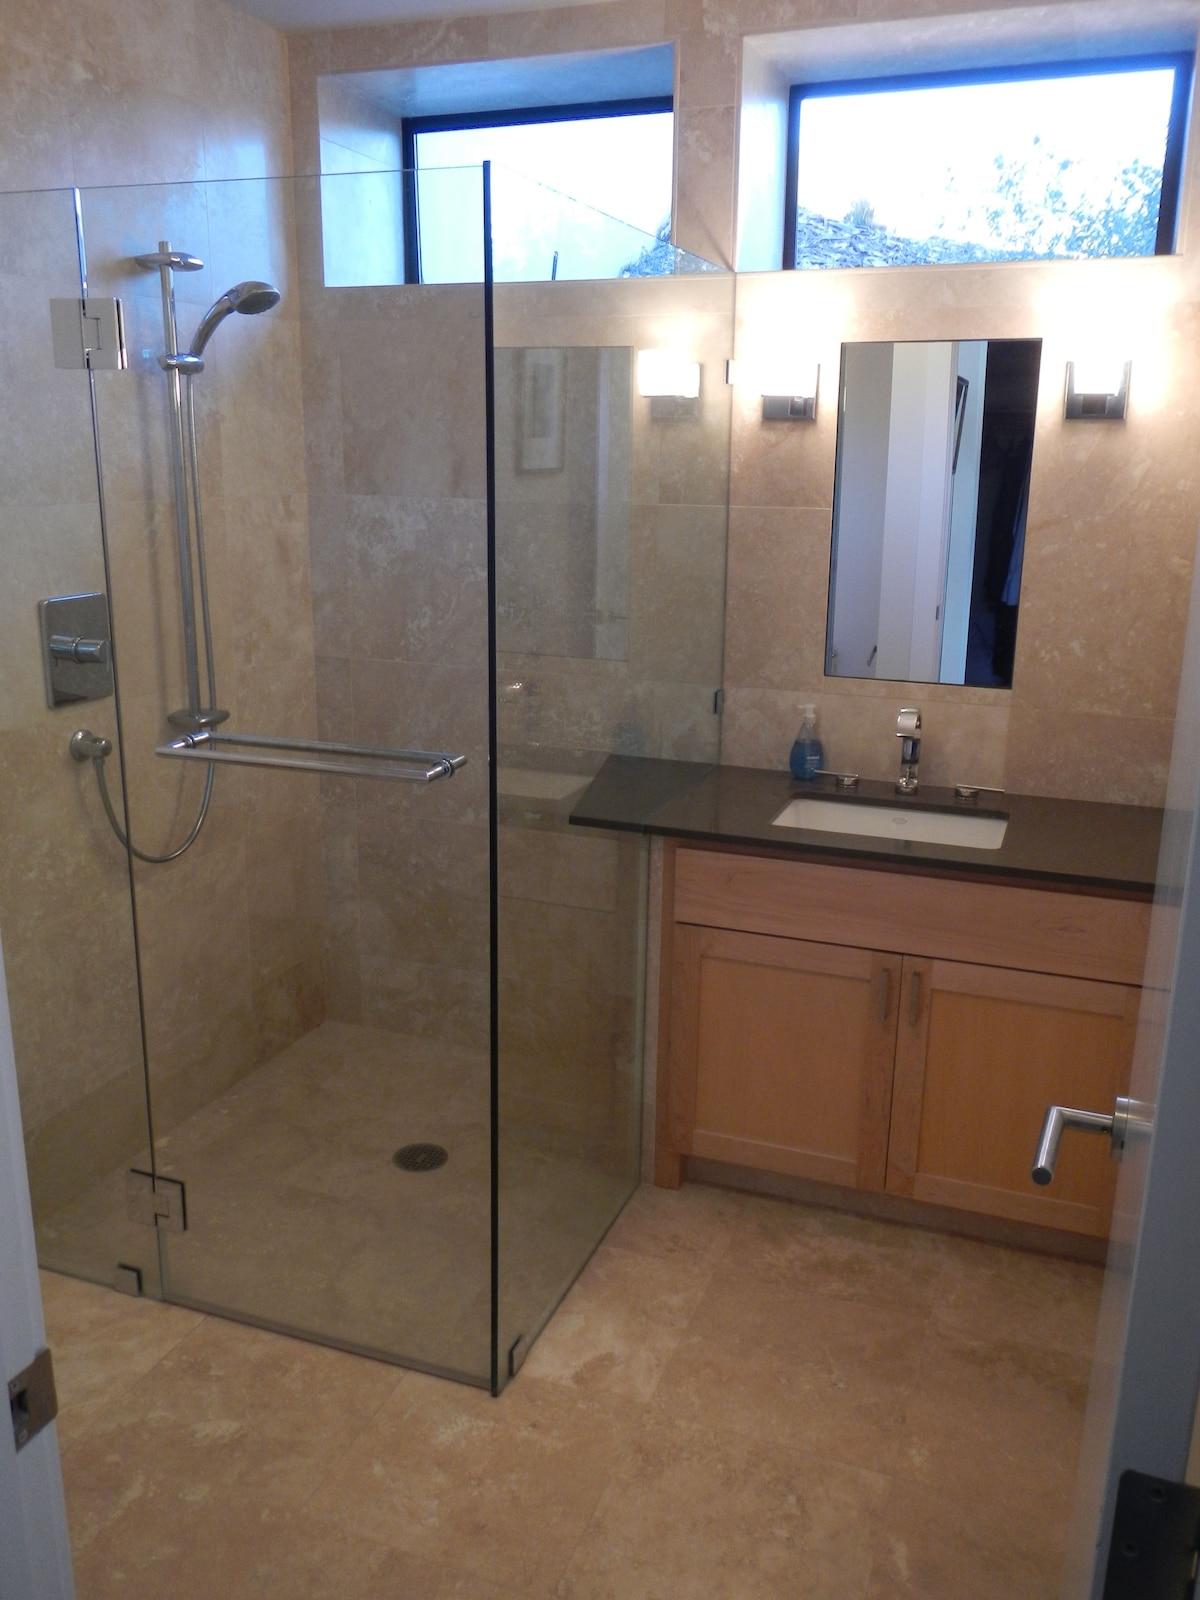 Spacious room with ensuite bathroom